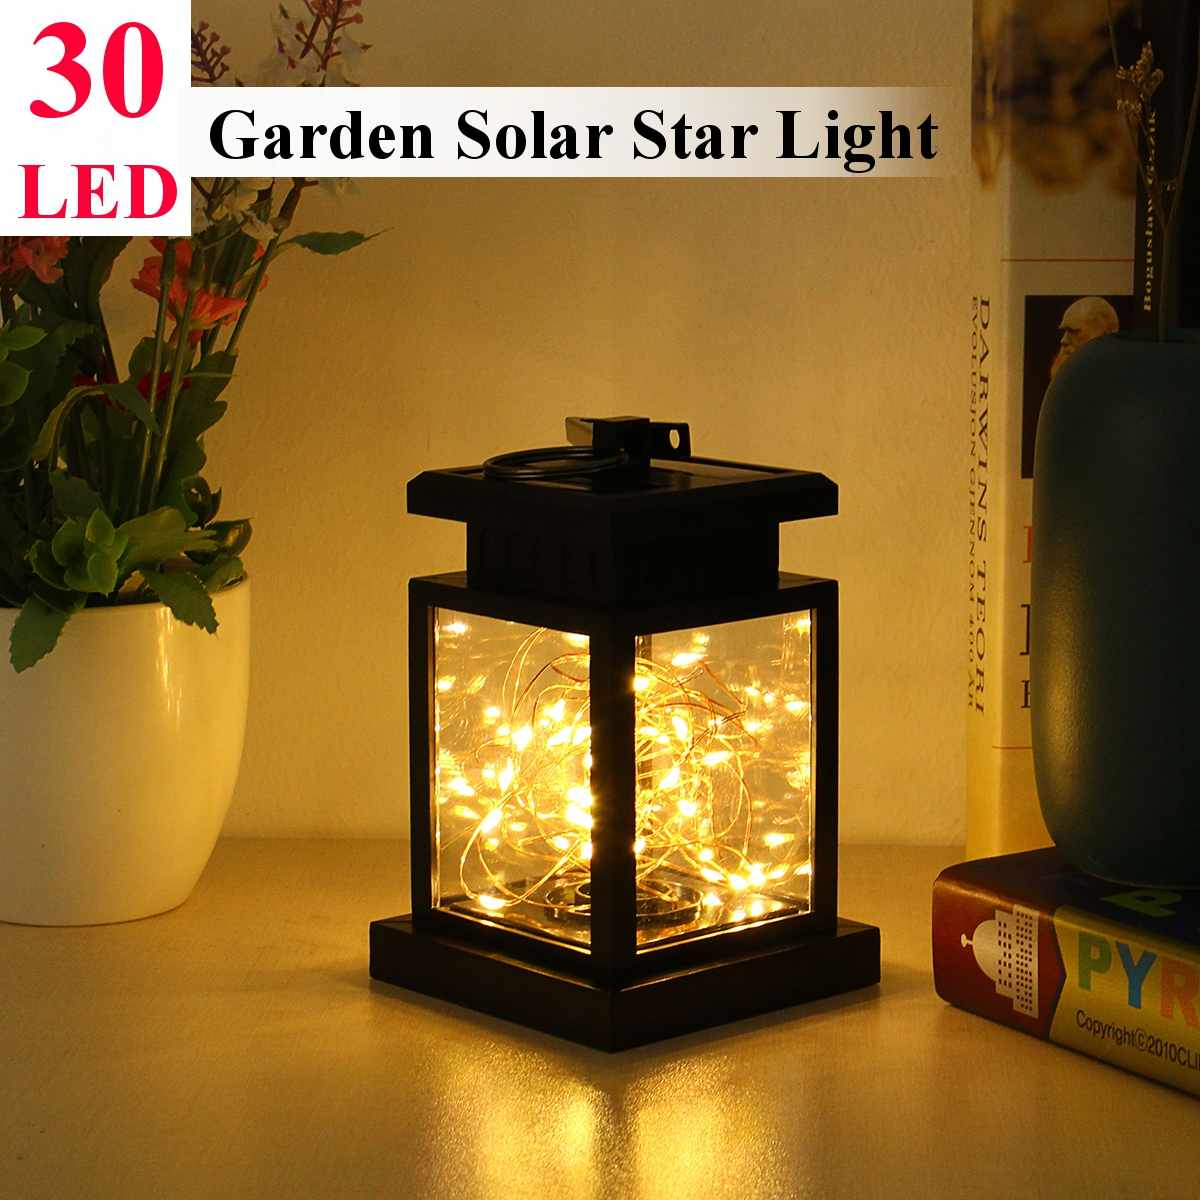 30LED IP44 Waterproof LED Solar Power Garden Light Outdoor Lighting Hanging Solar For Camping String Lantern Decorative Romantic